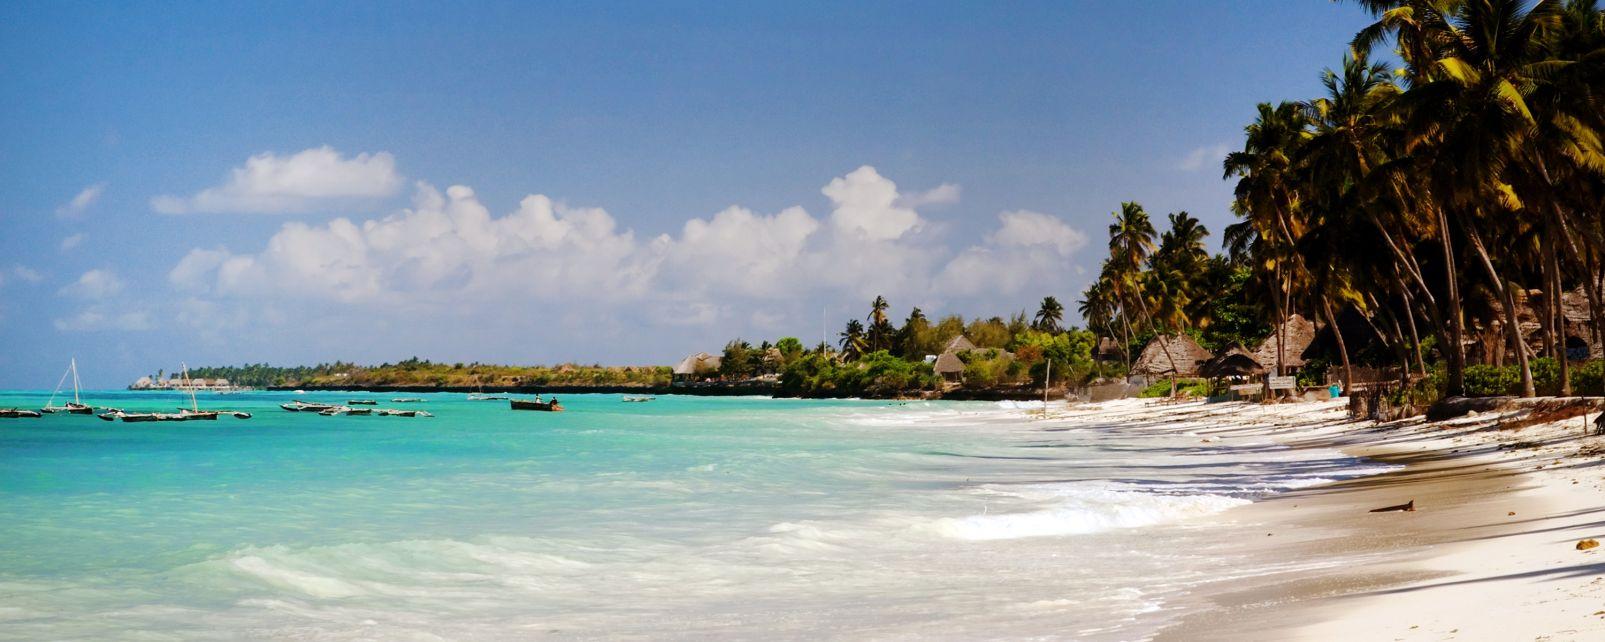 The village of Paje, The east coast, Coasts, Jambiani, Zanzibar